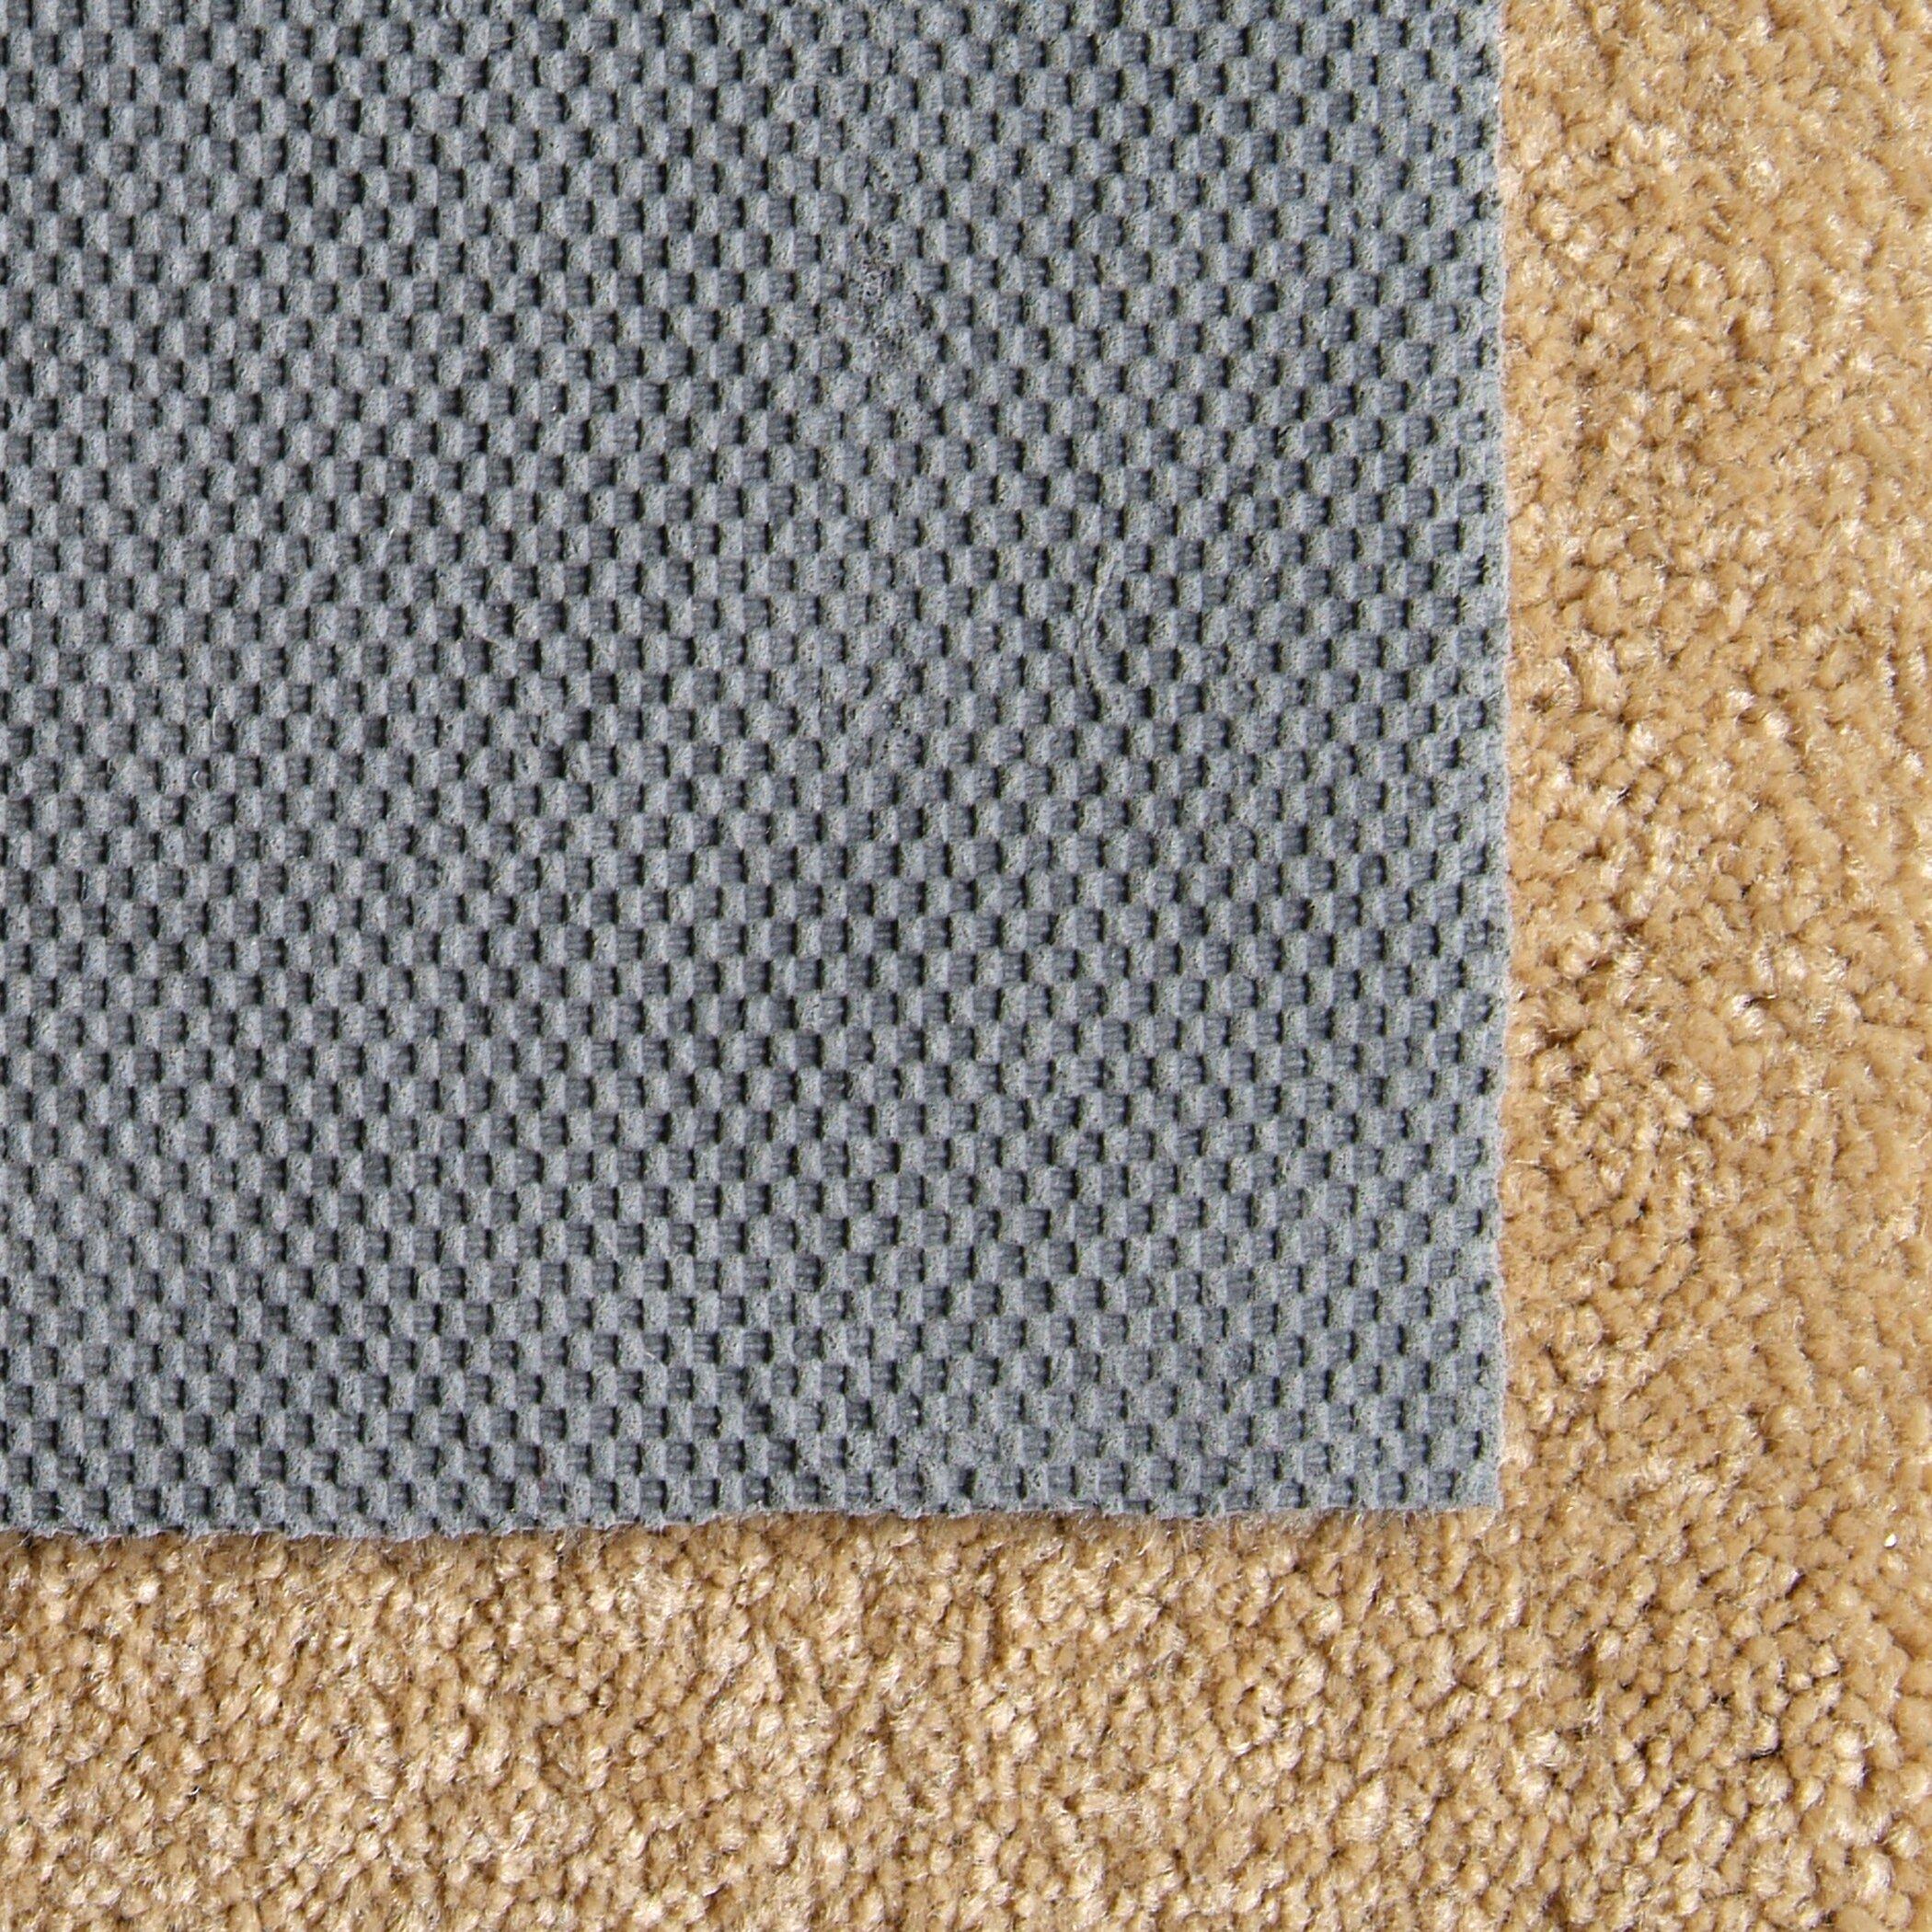 Ikea Felt Rug Pad Review: Vantage Industries MoveNot Non-Slip Rug Pad & Reviews